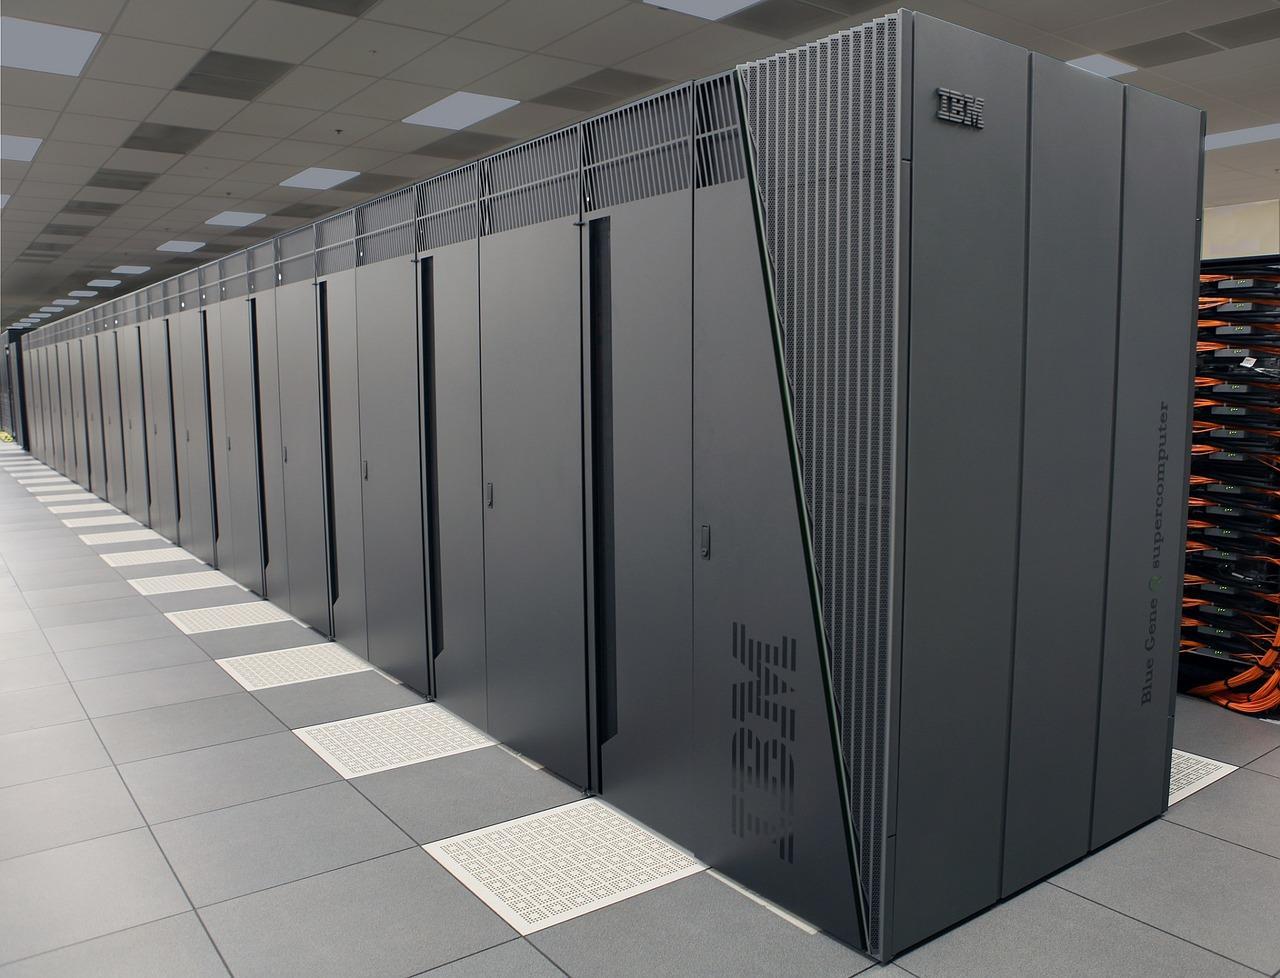 uploads///supercomputer _